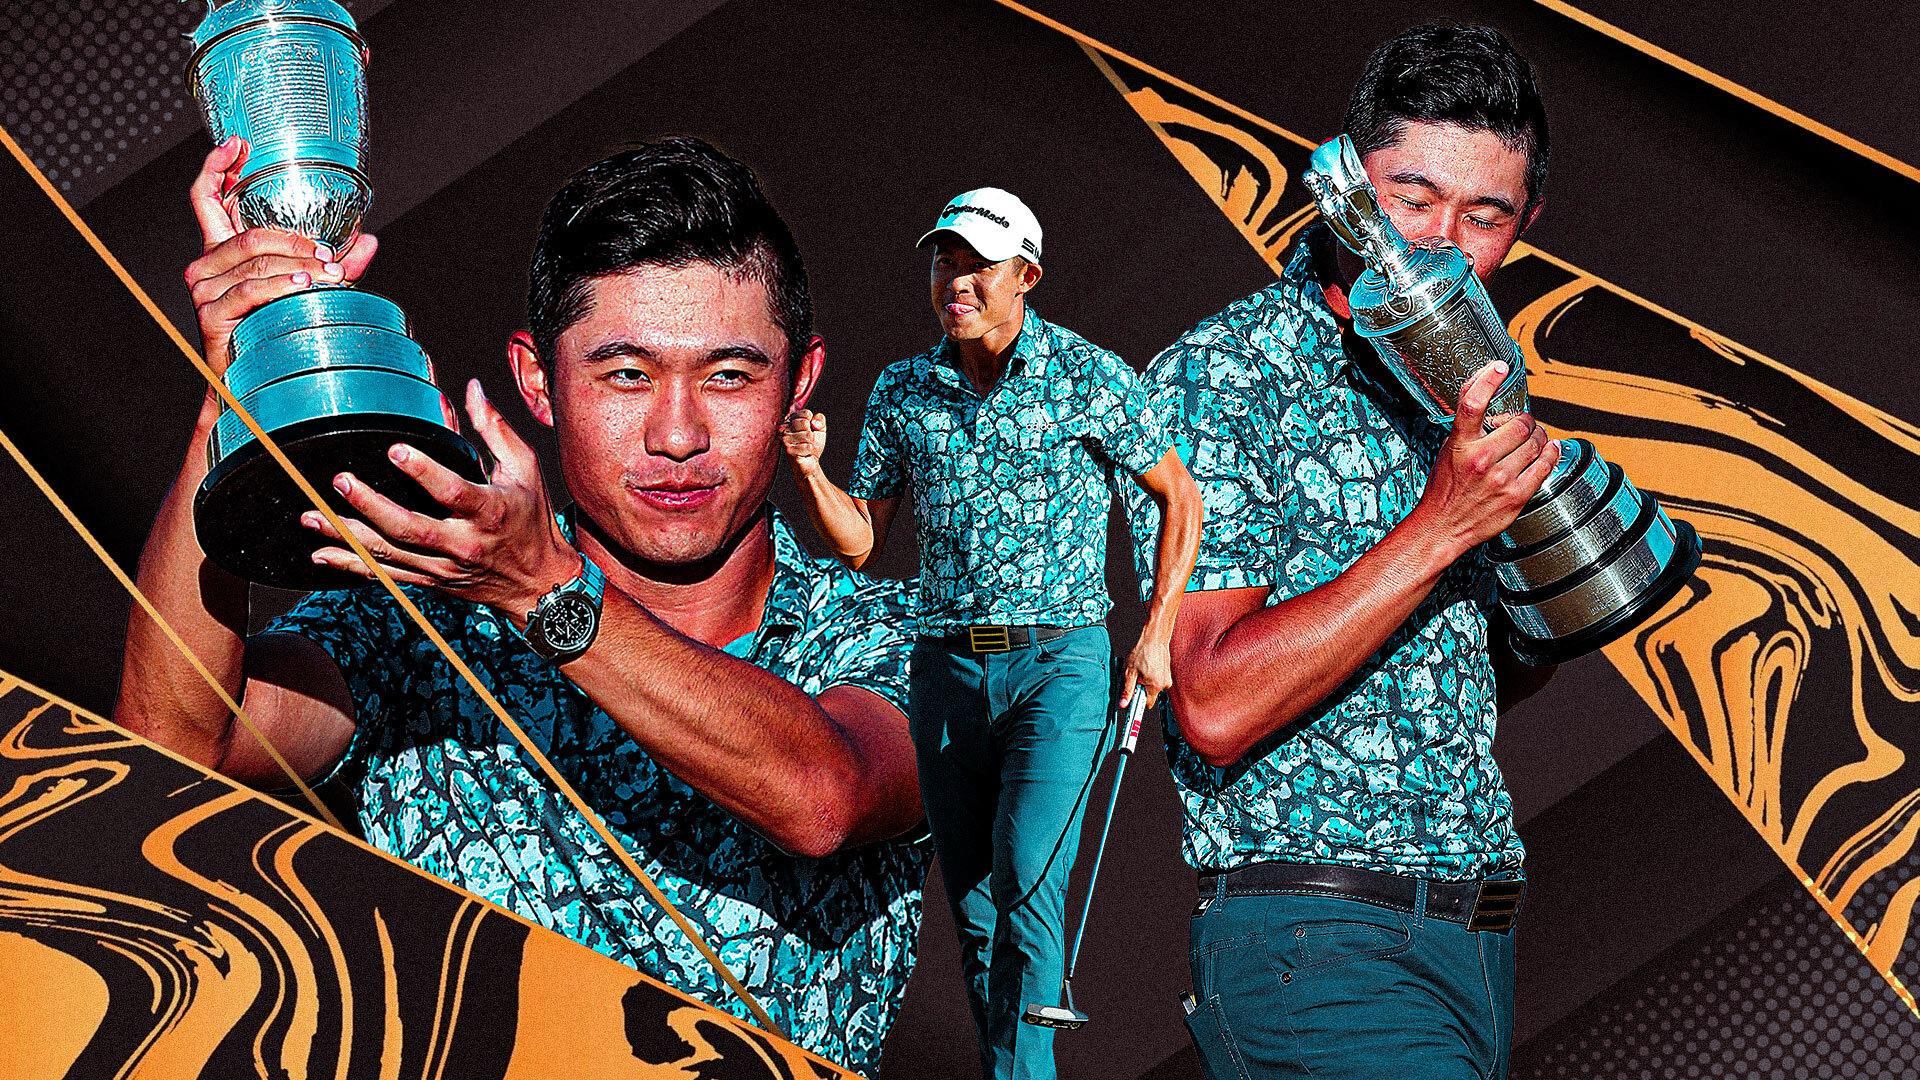 2021 Open Championship: Collin Morikawa outduels Jordan Spieth for claret jug